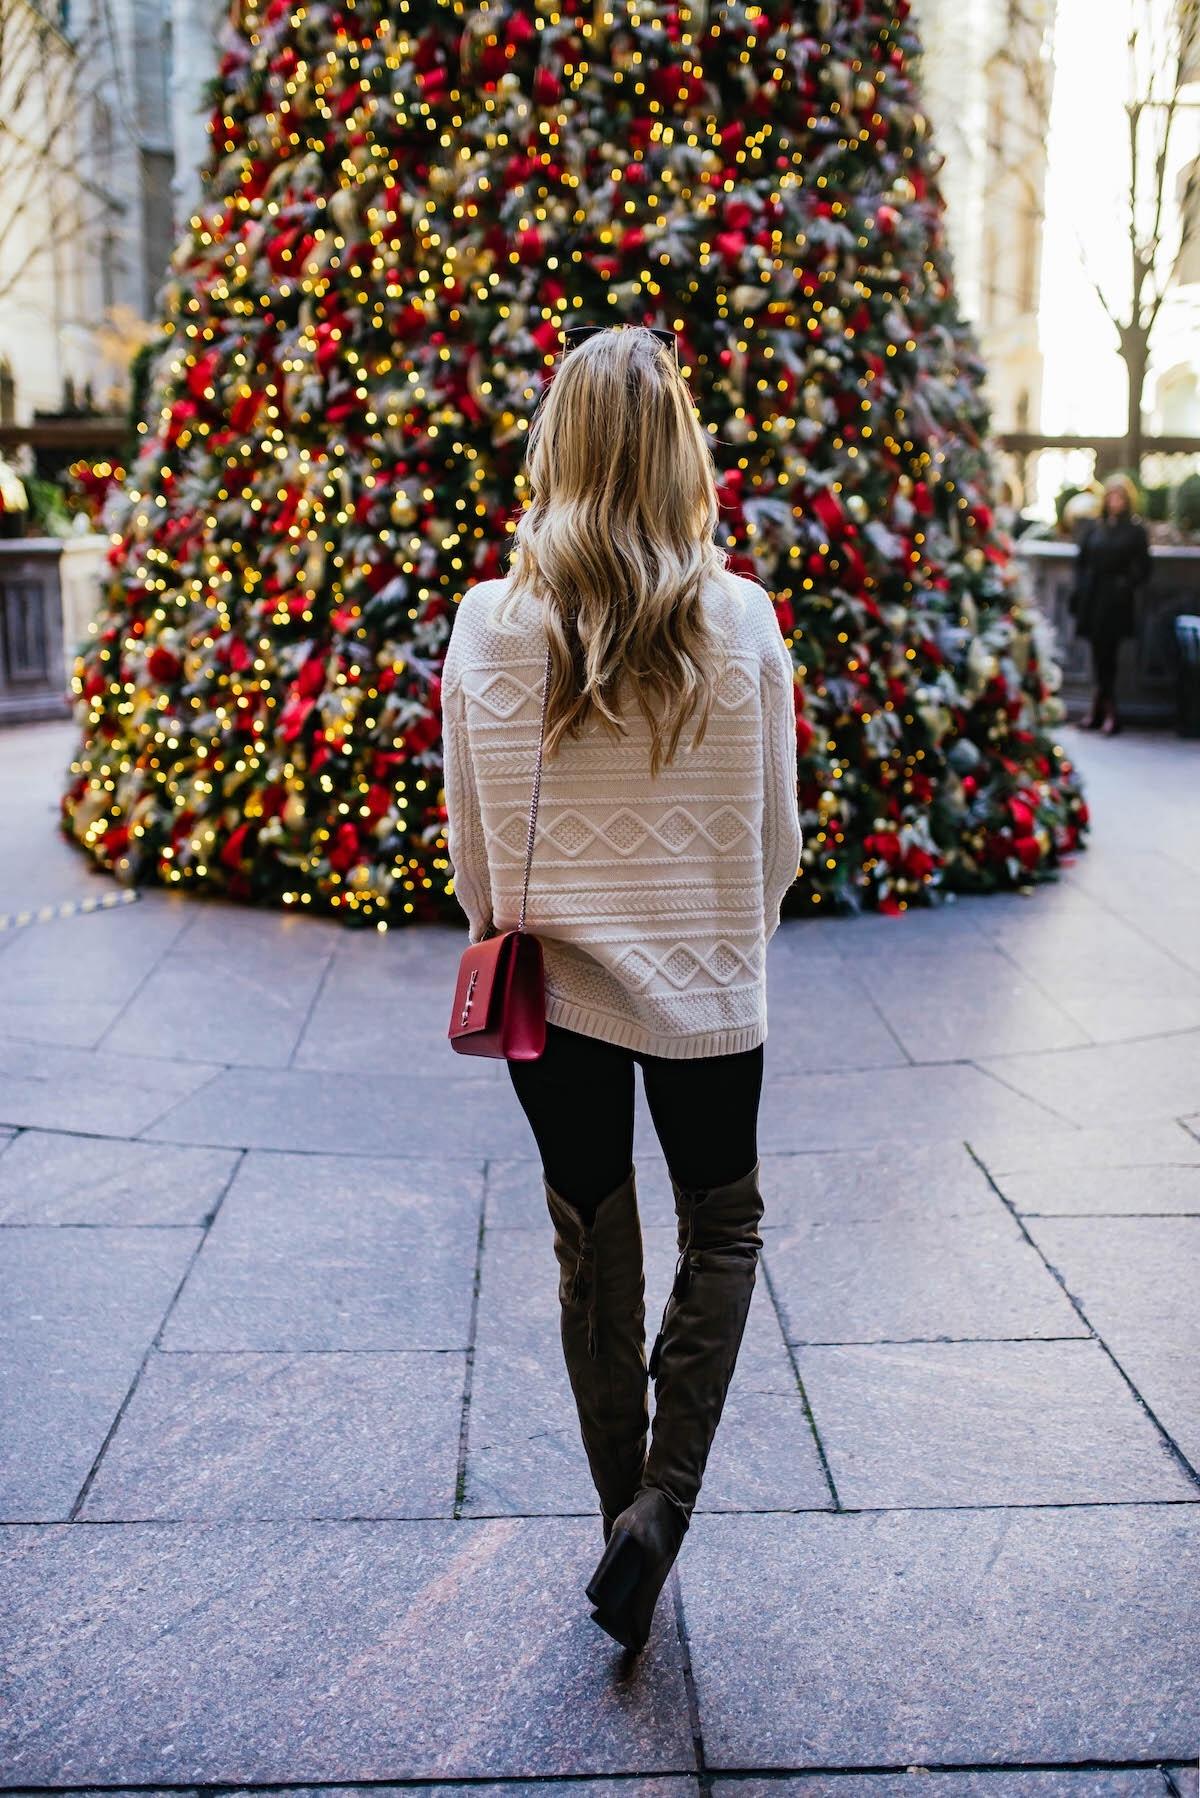 Lotte New York Palace Hotel Christmas Tree